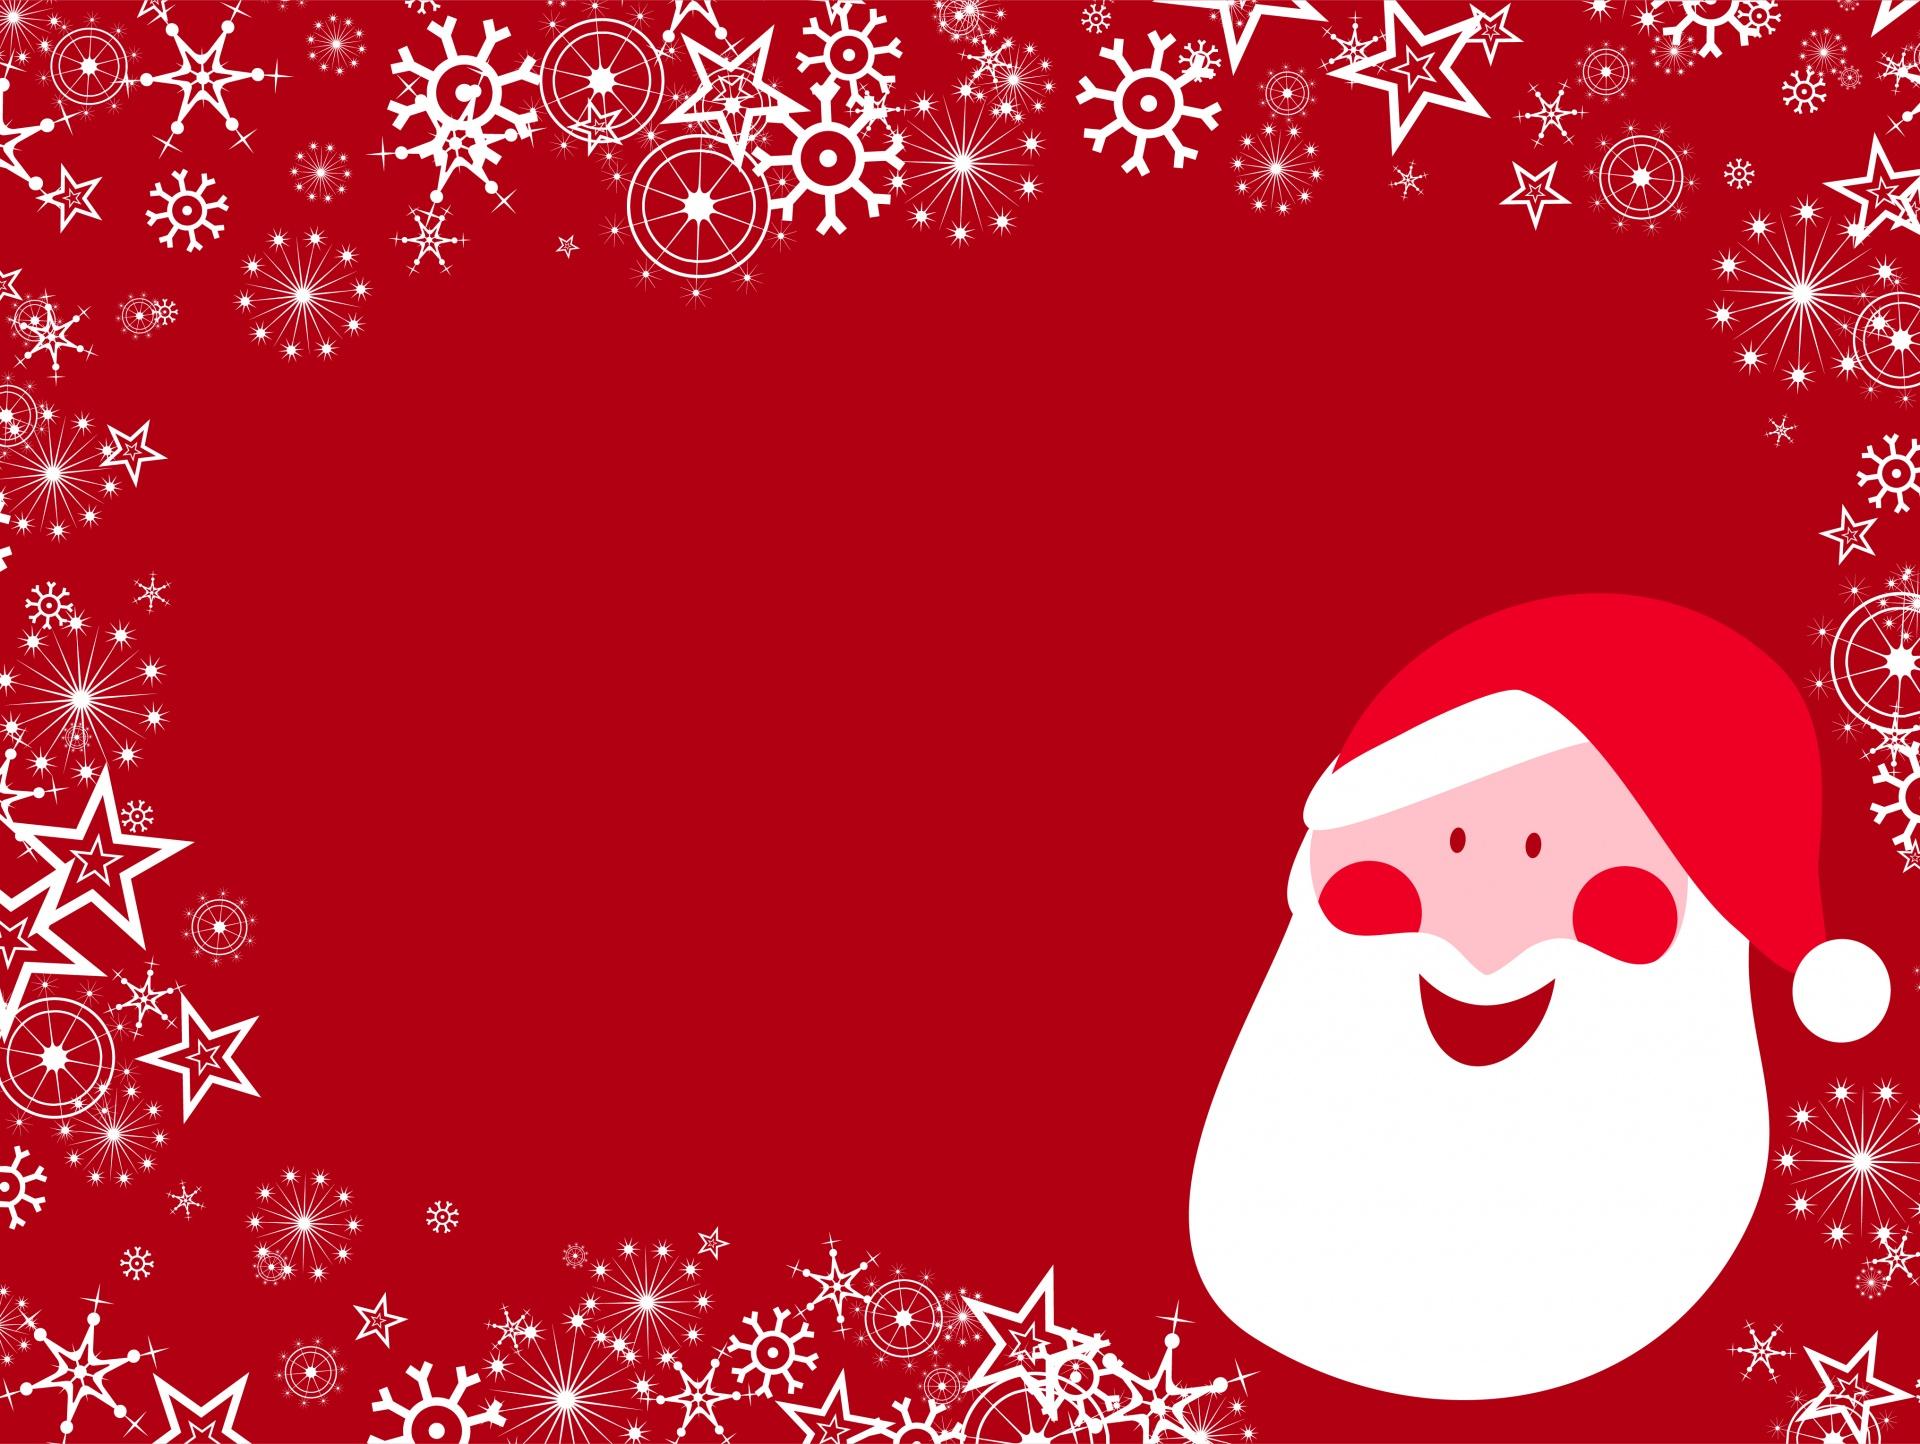 Falling Snow Wallpaper Note 3 Christmas Santa Free Stock Photo Public Domain Pictures